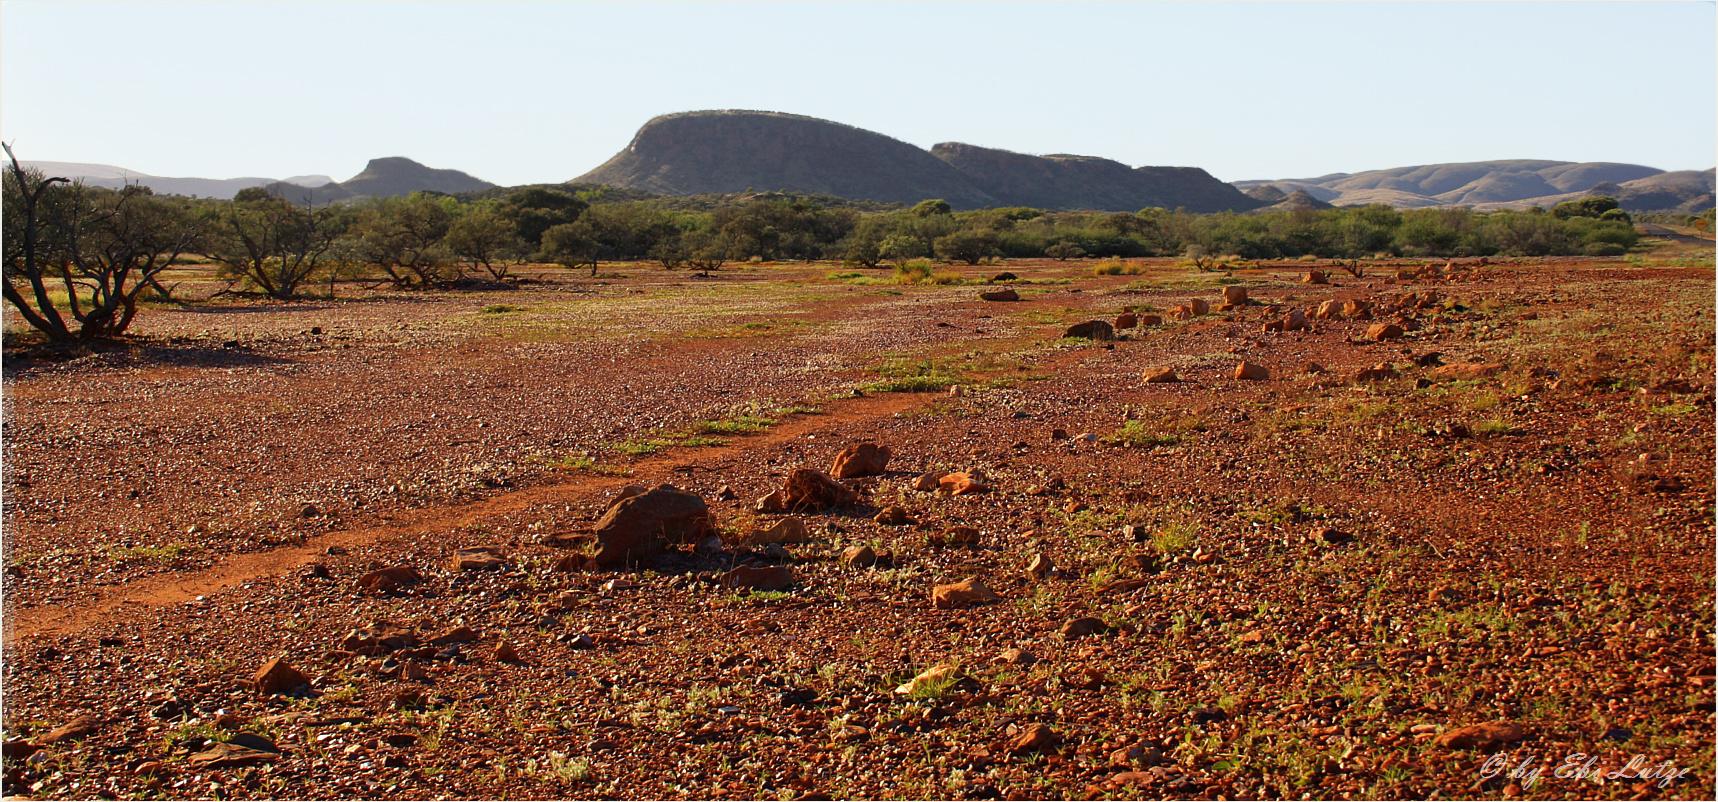 ** The Landscape of the Pilbara / Iron Ore Deposit of Australia **